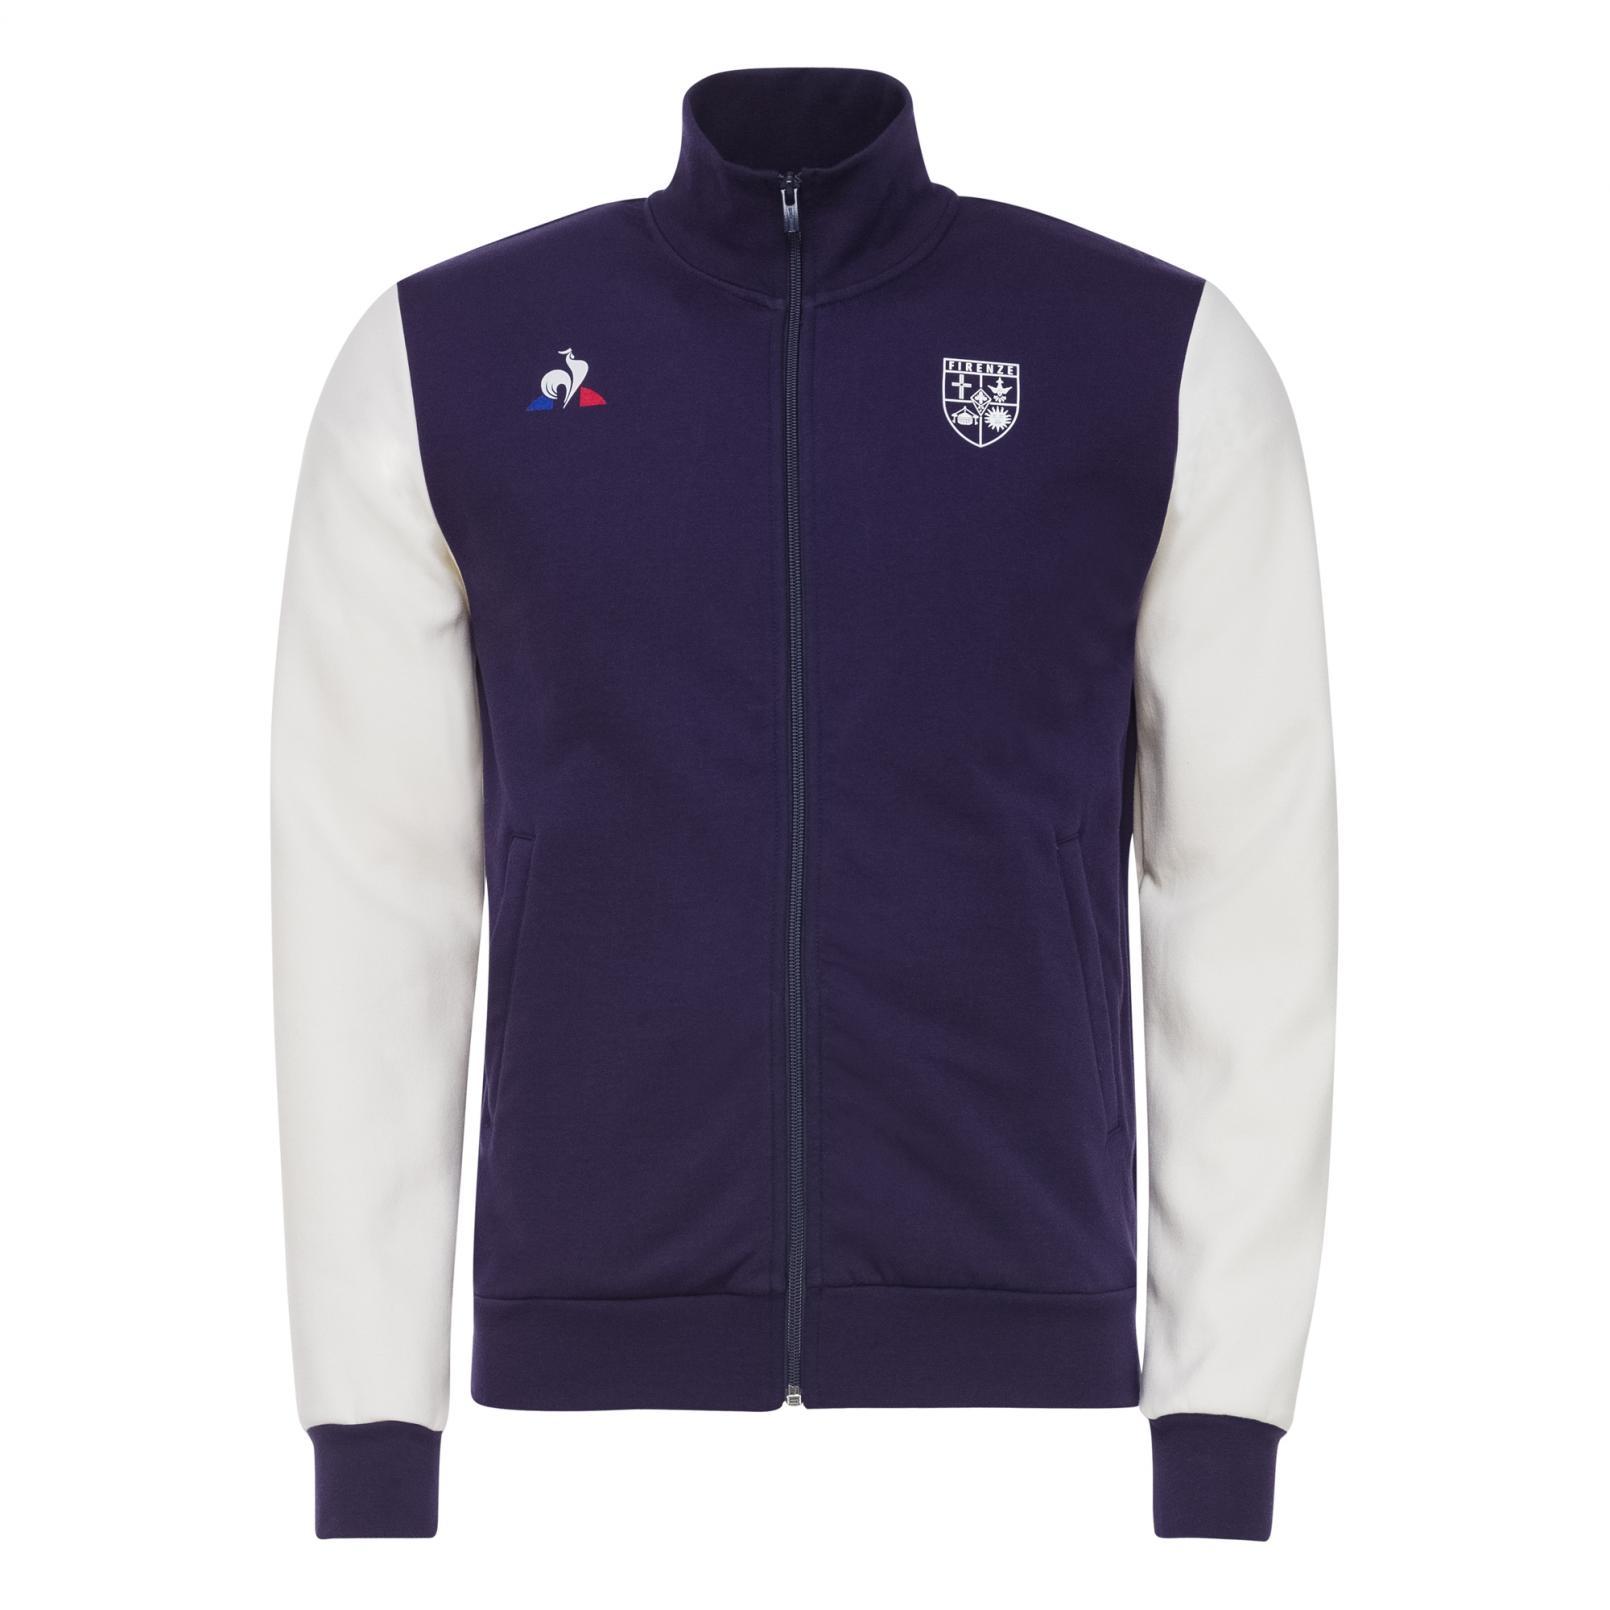 Coats & Jackets – Le Coq Sportif Fiorentina Fanwear Tracktop Purple